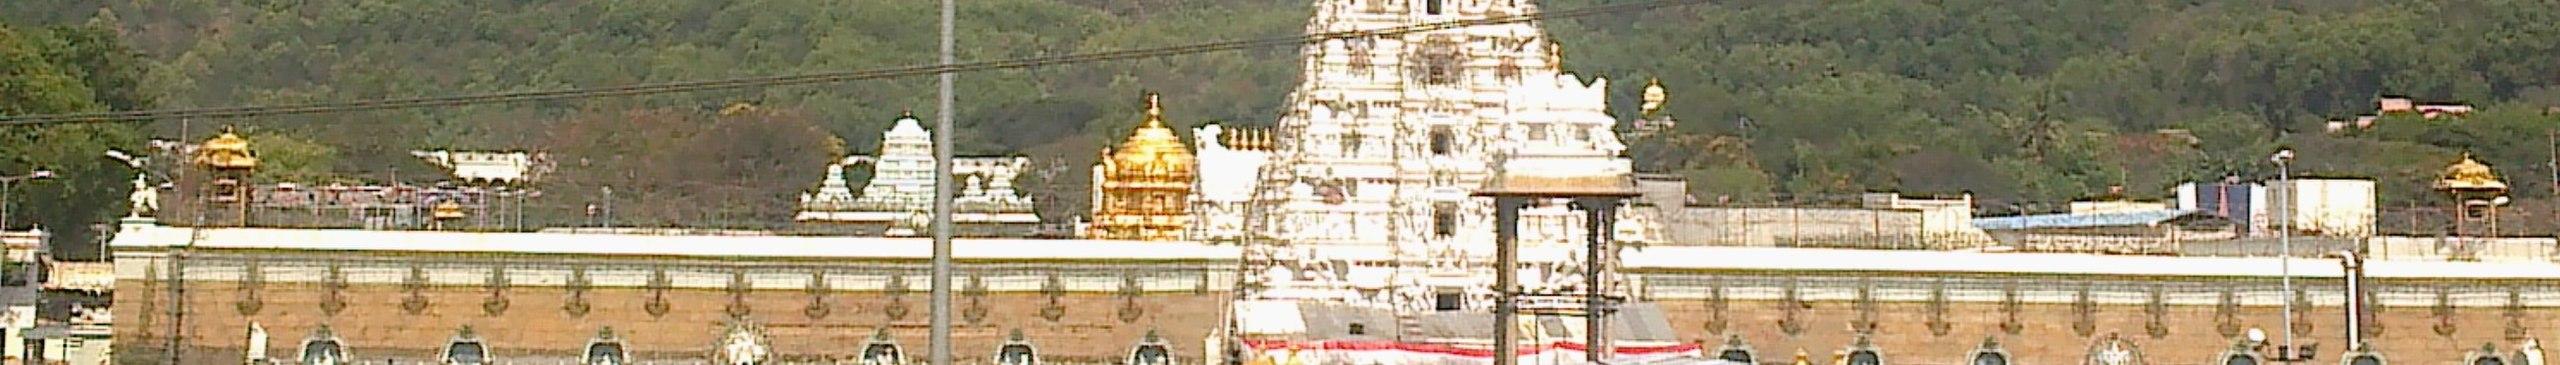 Tirupati – Travel guide at Wikivoyage